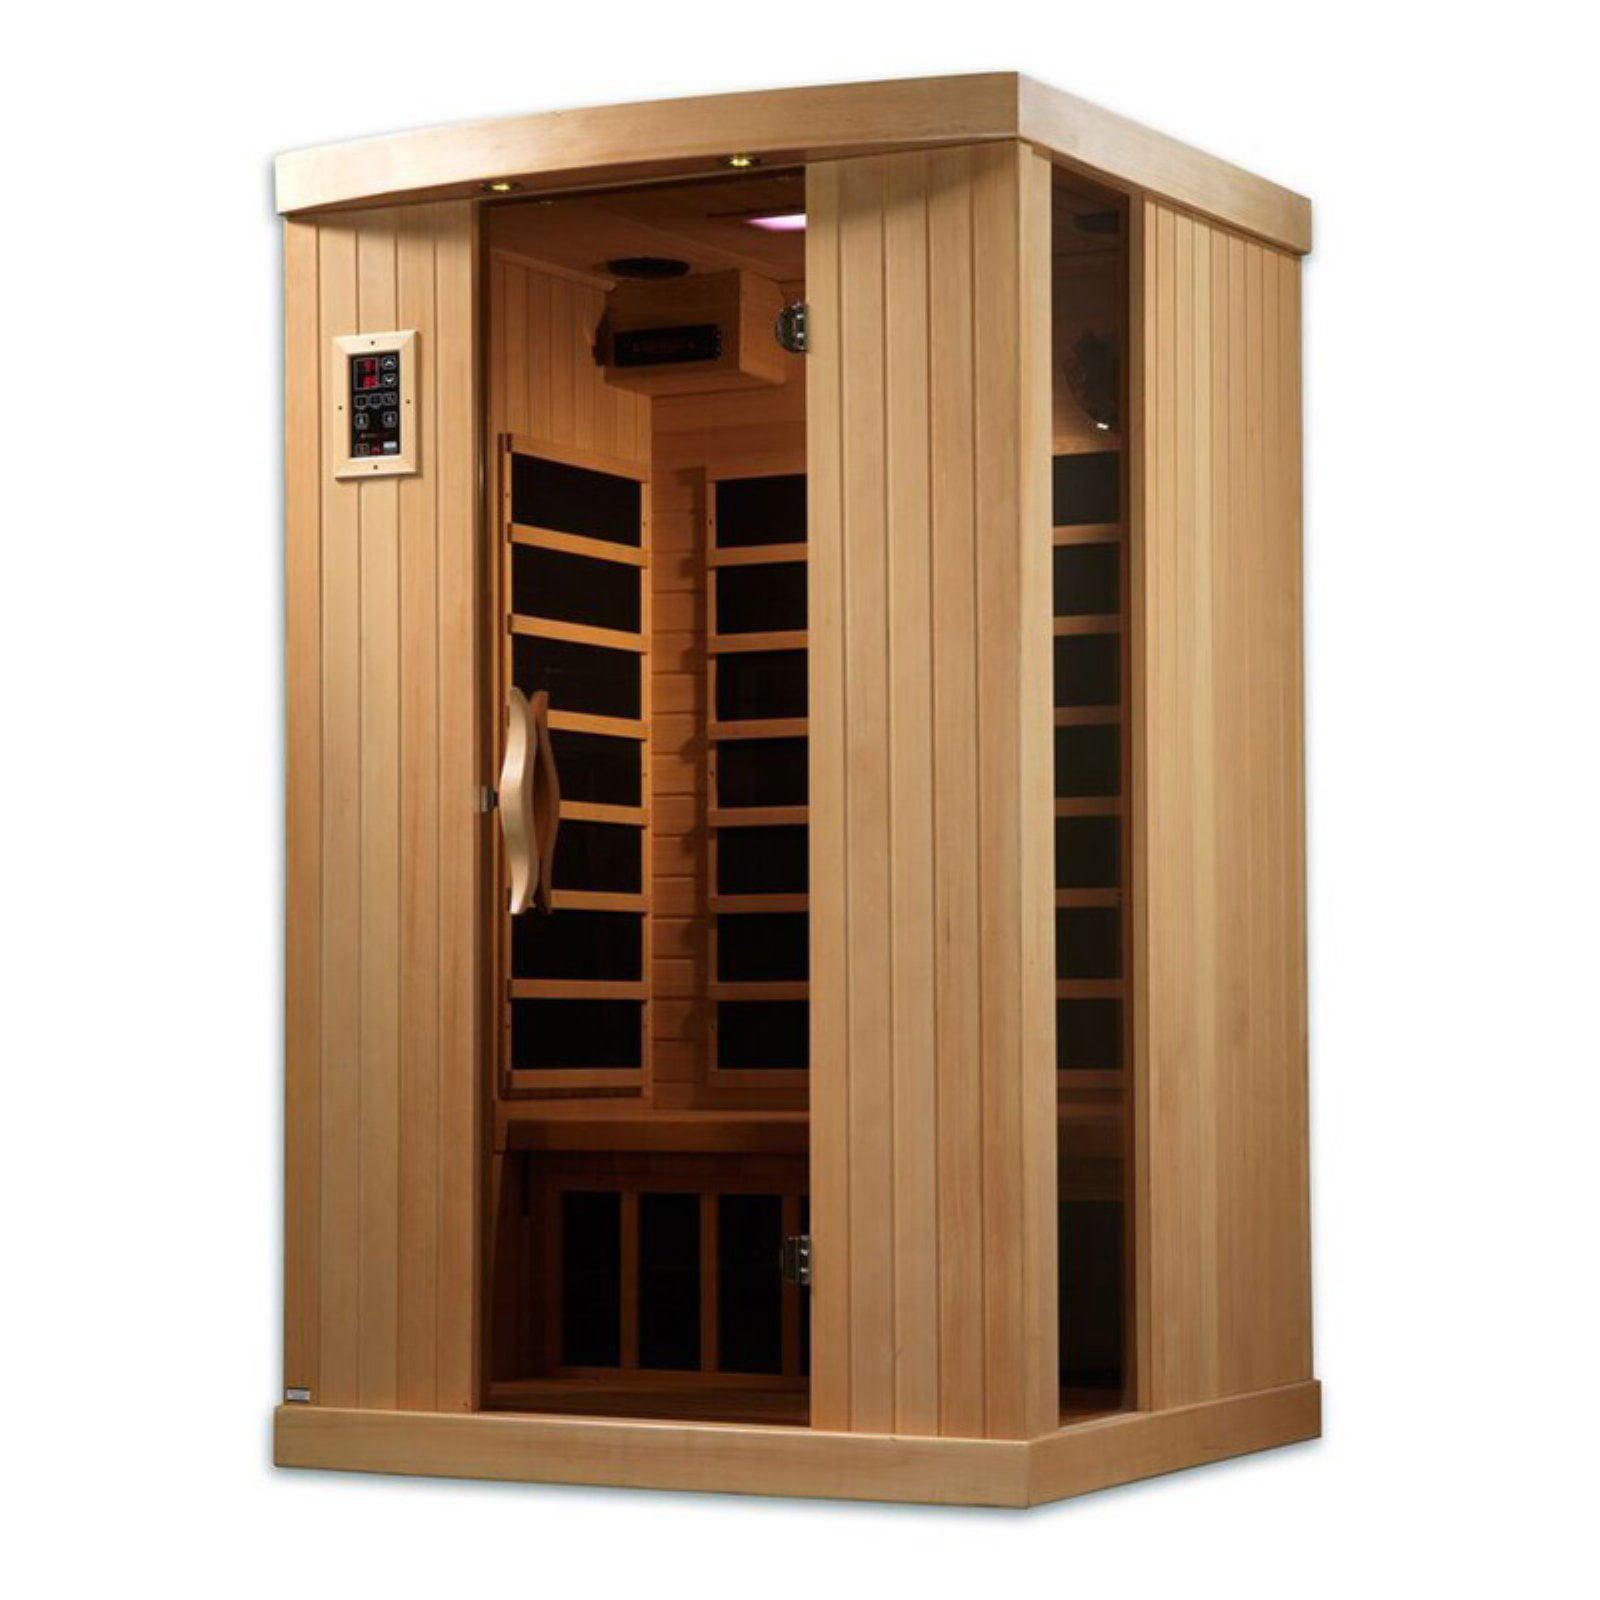 Golden Designs Inc. 2 Person FAR Infrared Sauna